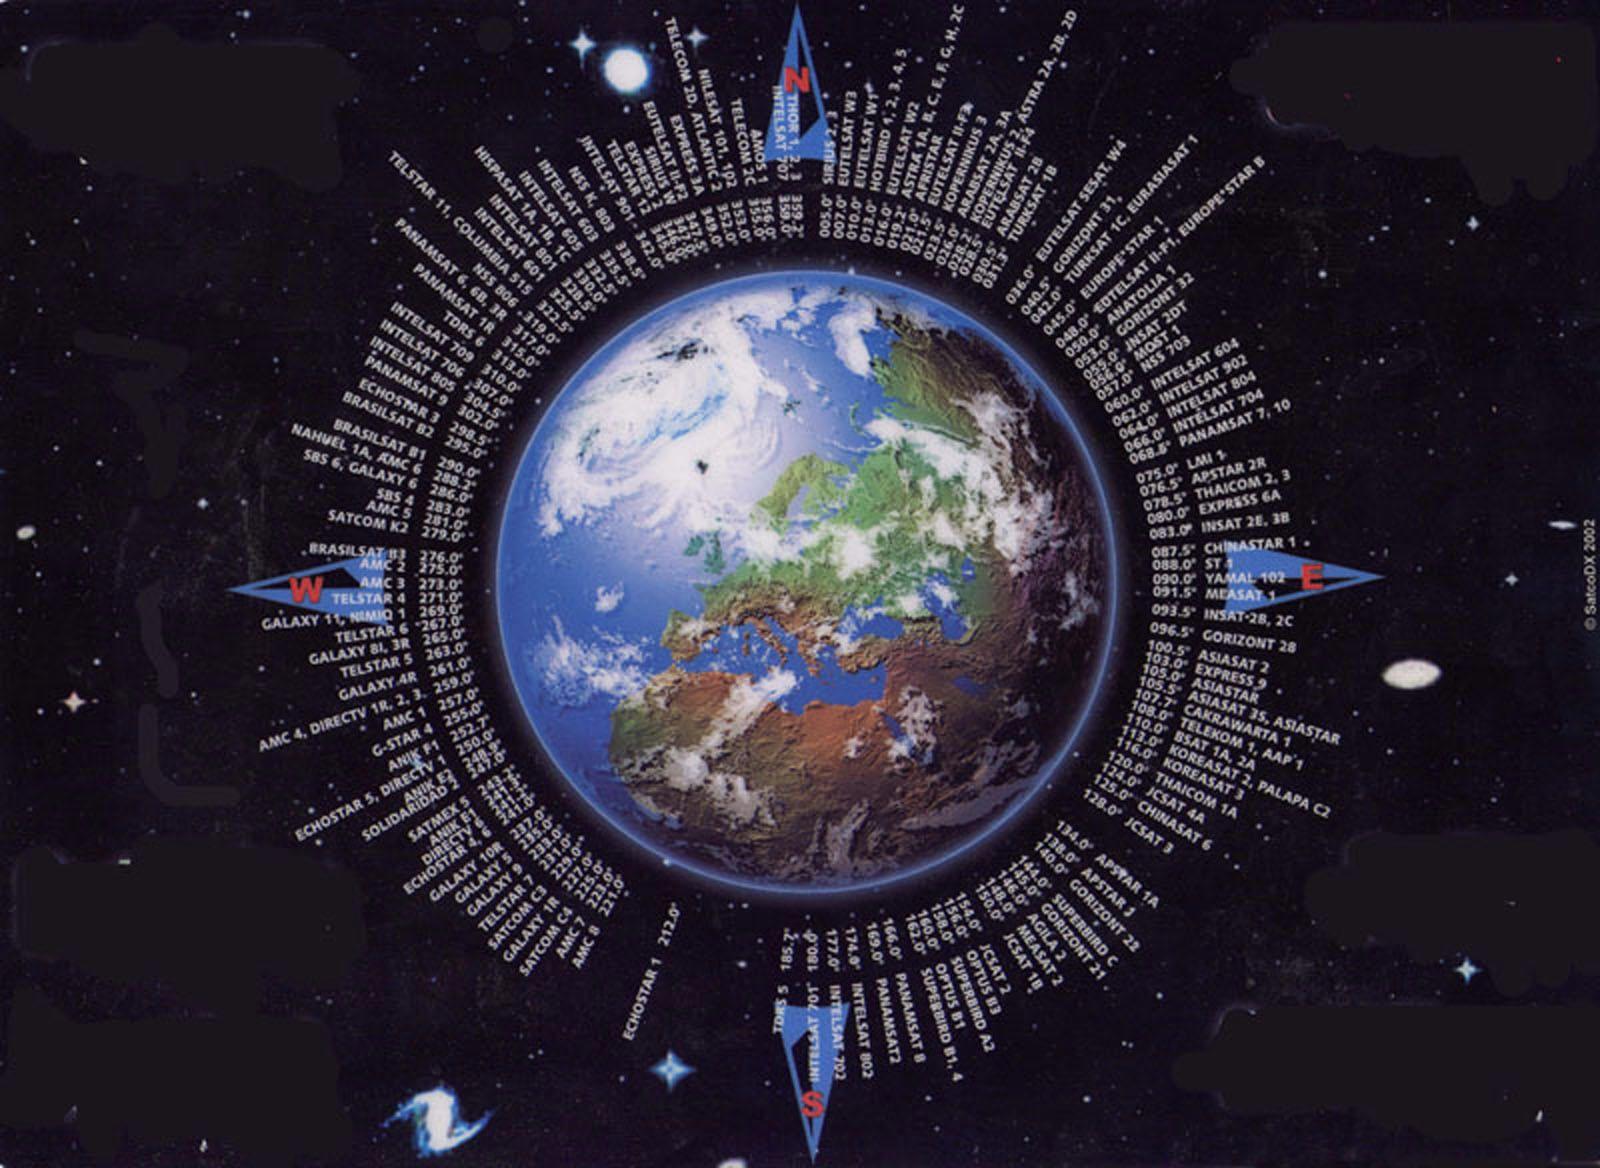 Satellites Mapped Httpwwwmylocalinstallercomimgdiagrajpg - Satellites map